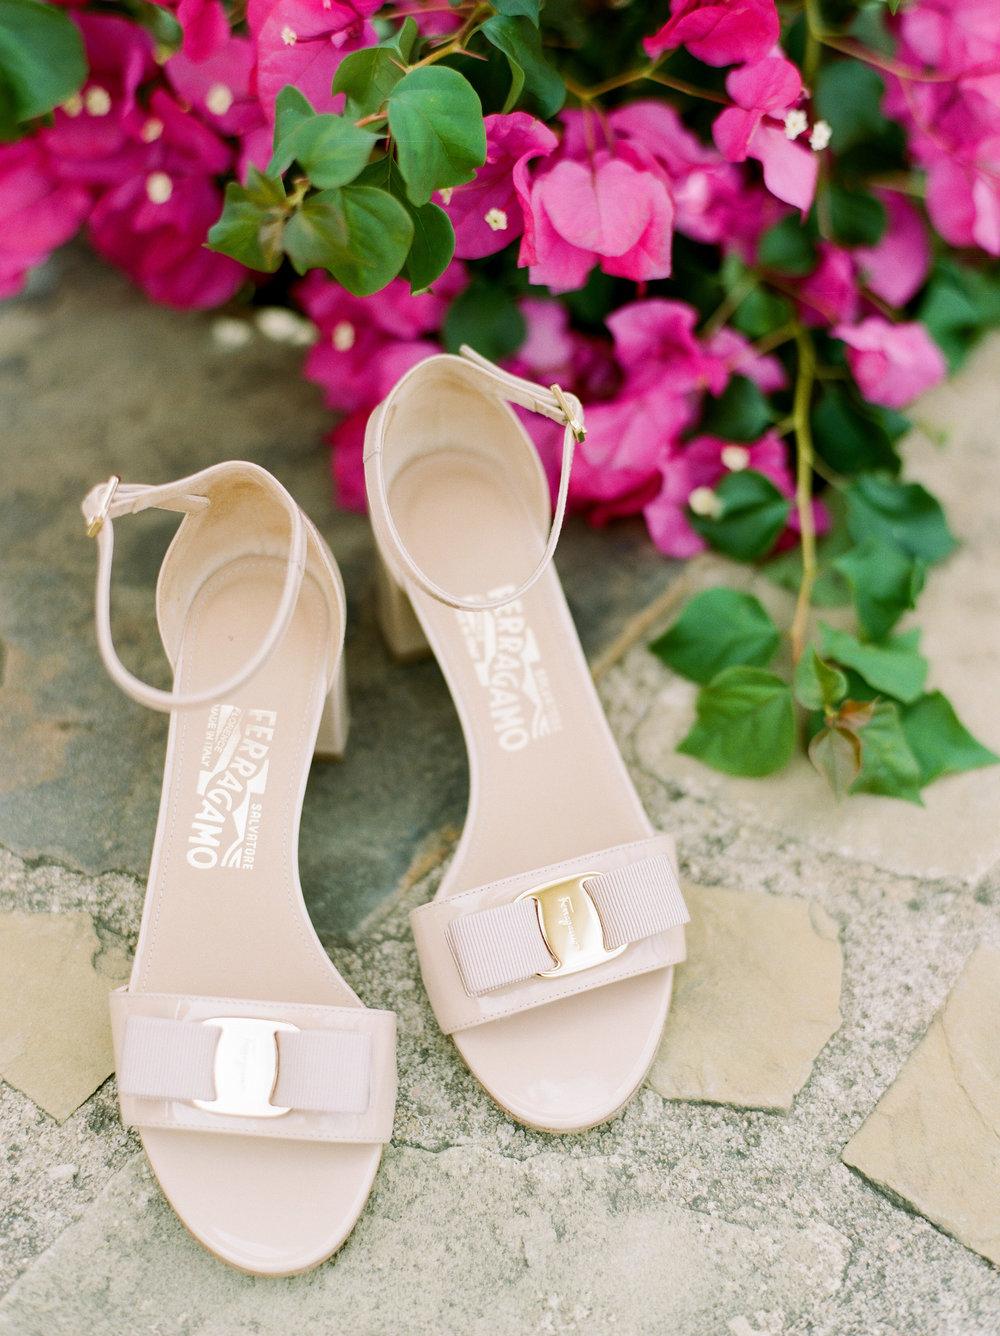 Escondido-Golf_Lake-Club-Hill-Country-Houston-Wedding-Photographer-Best-Top-Luxury-Destination-Engagements-Portrait-Austin-Photography-112.jpg